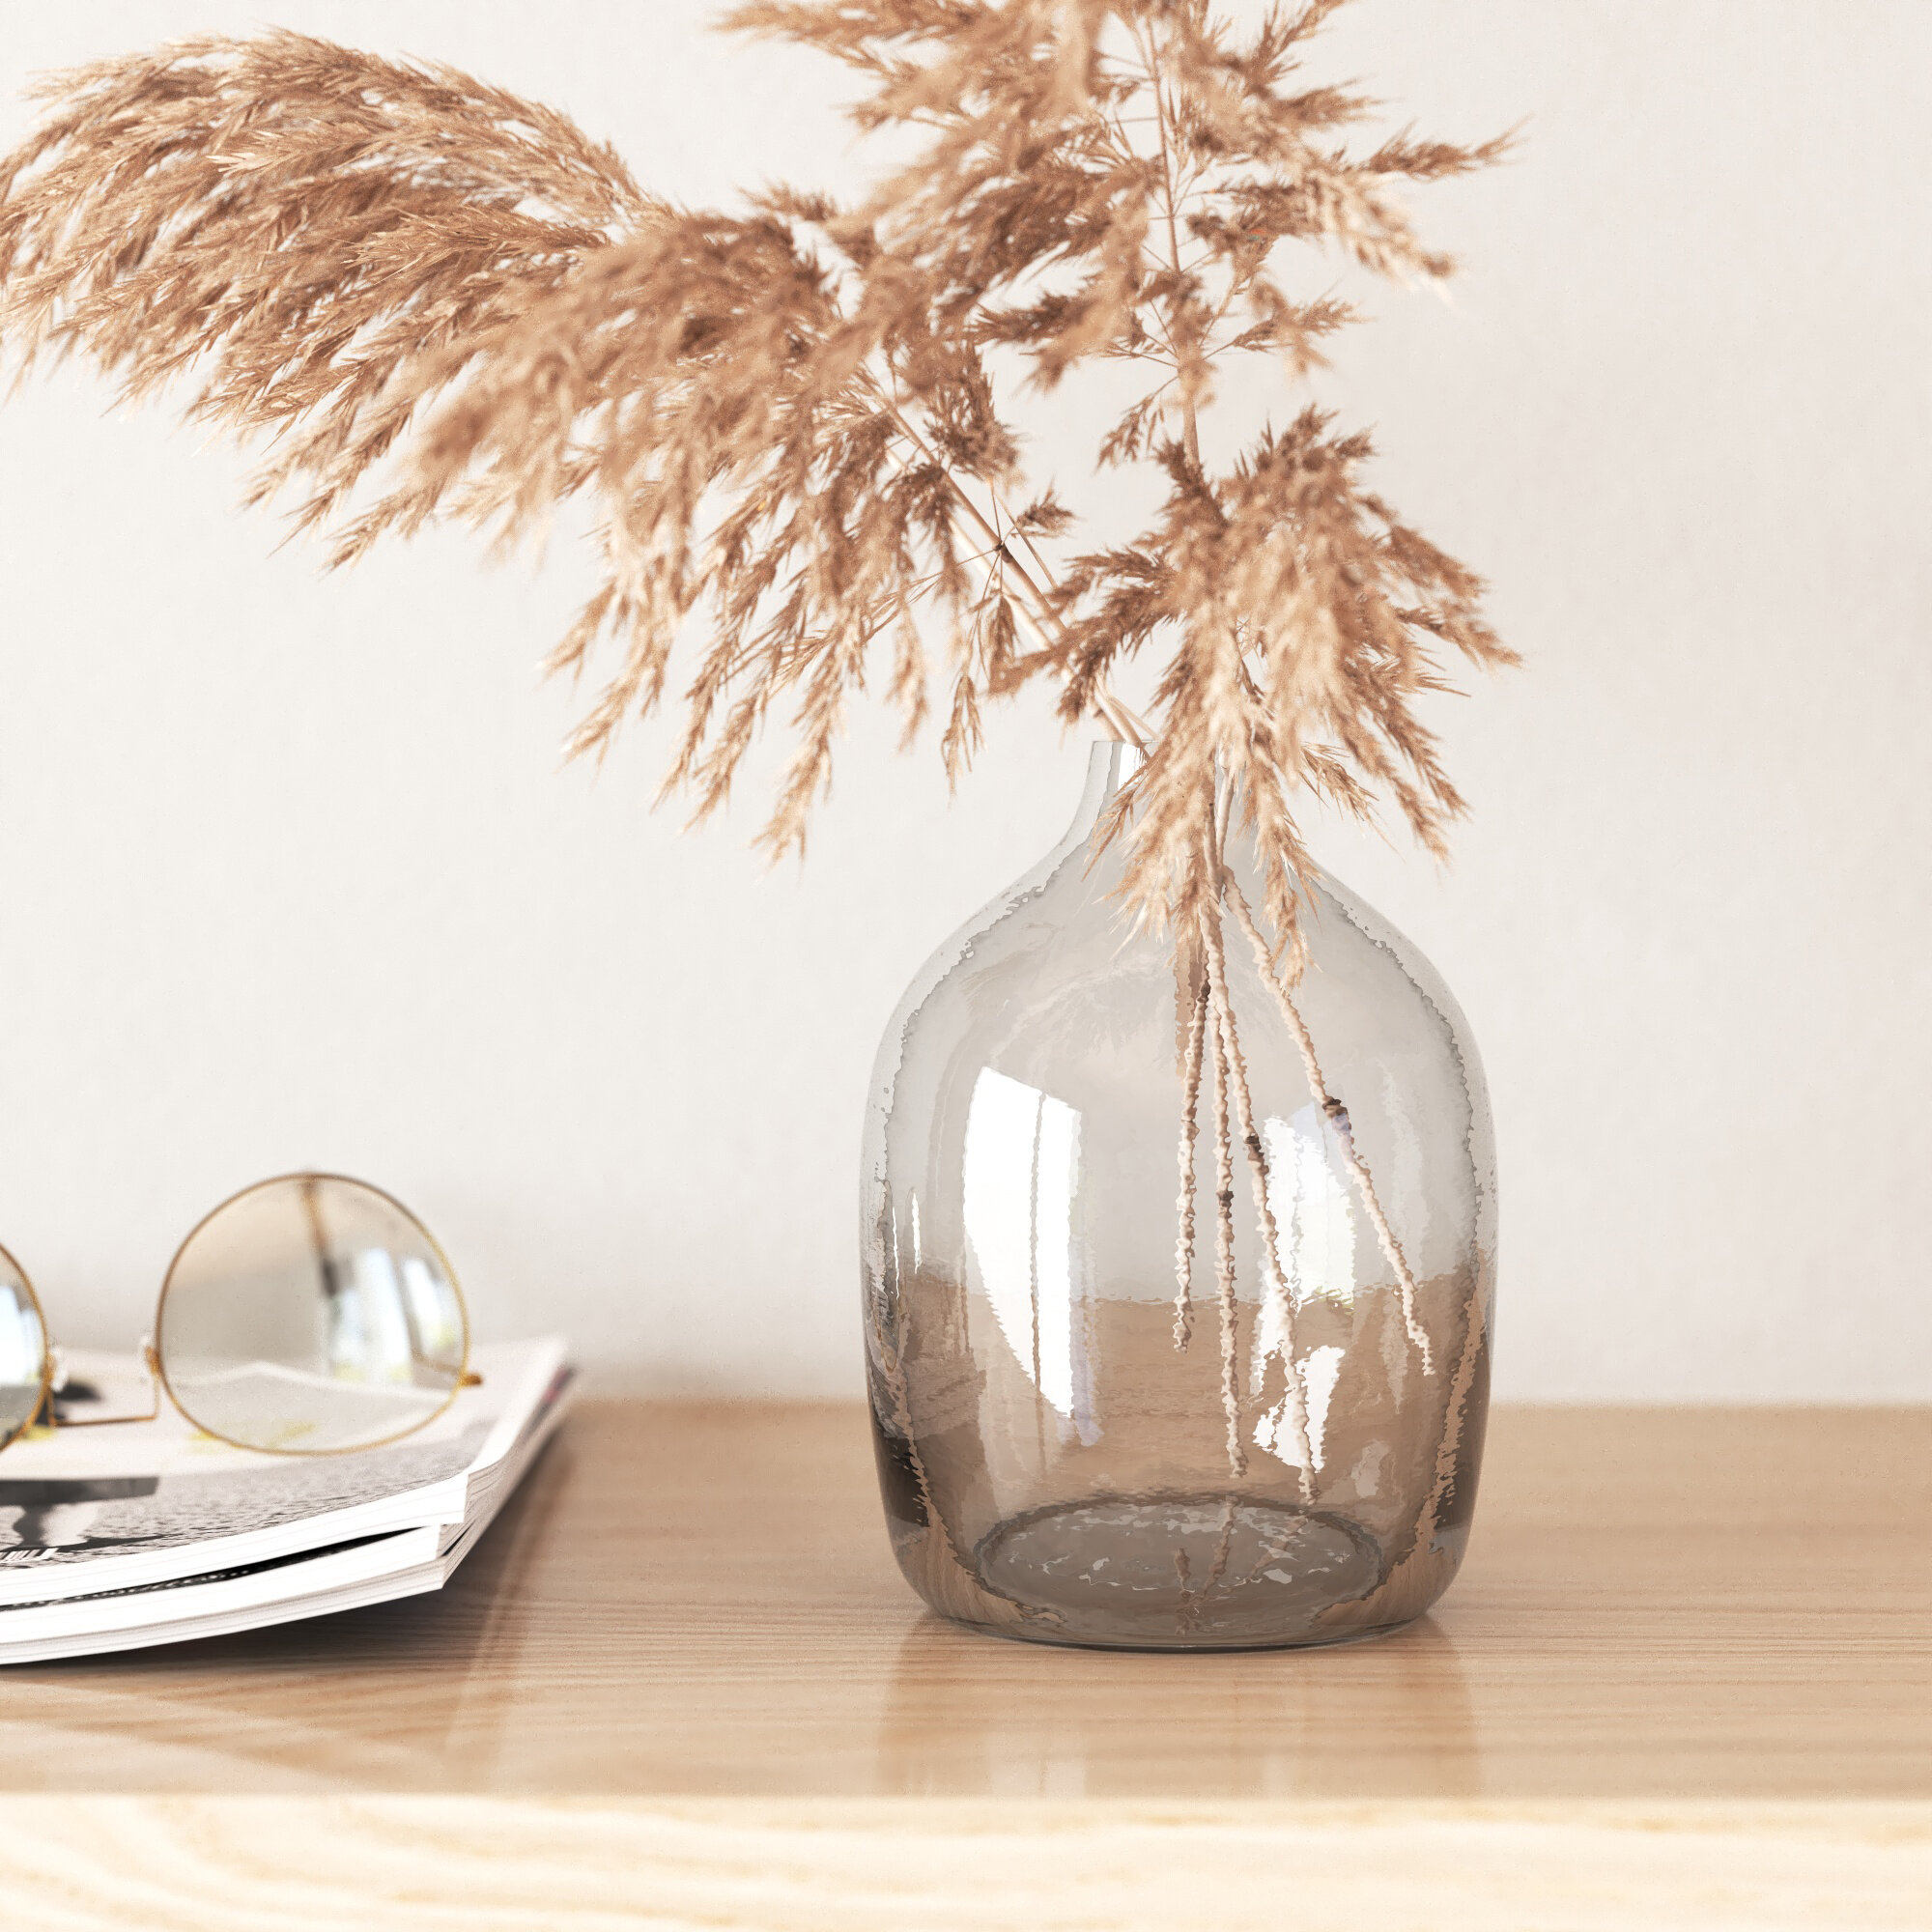 Glass Vases Urns Jars Bottles You Ll Love In 2021 Wayfair